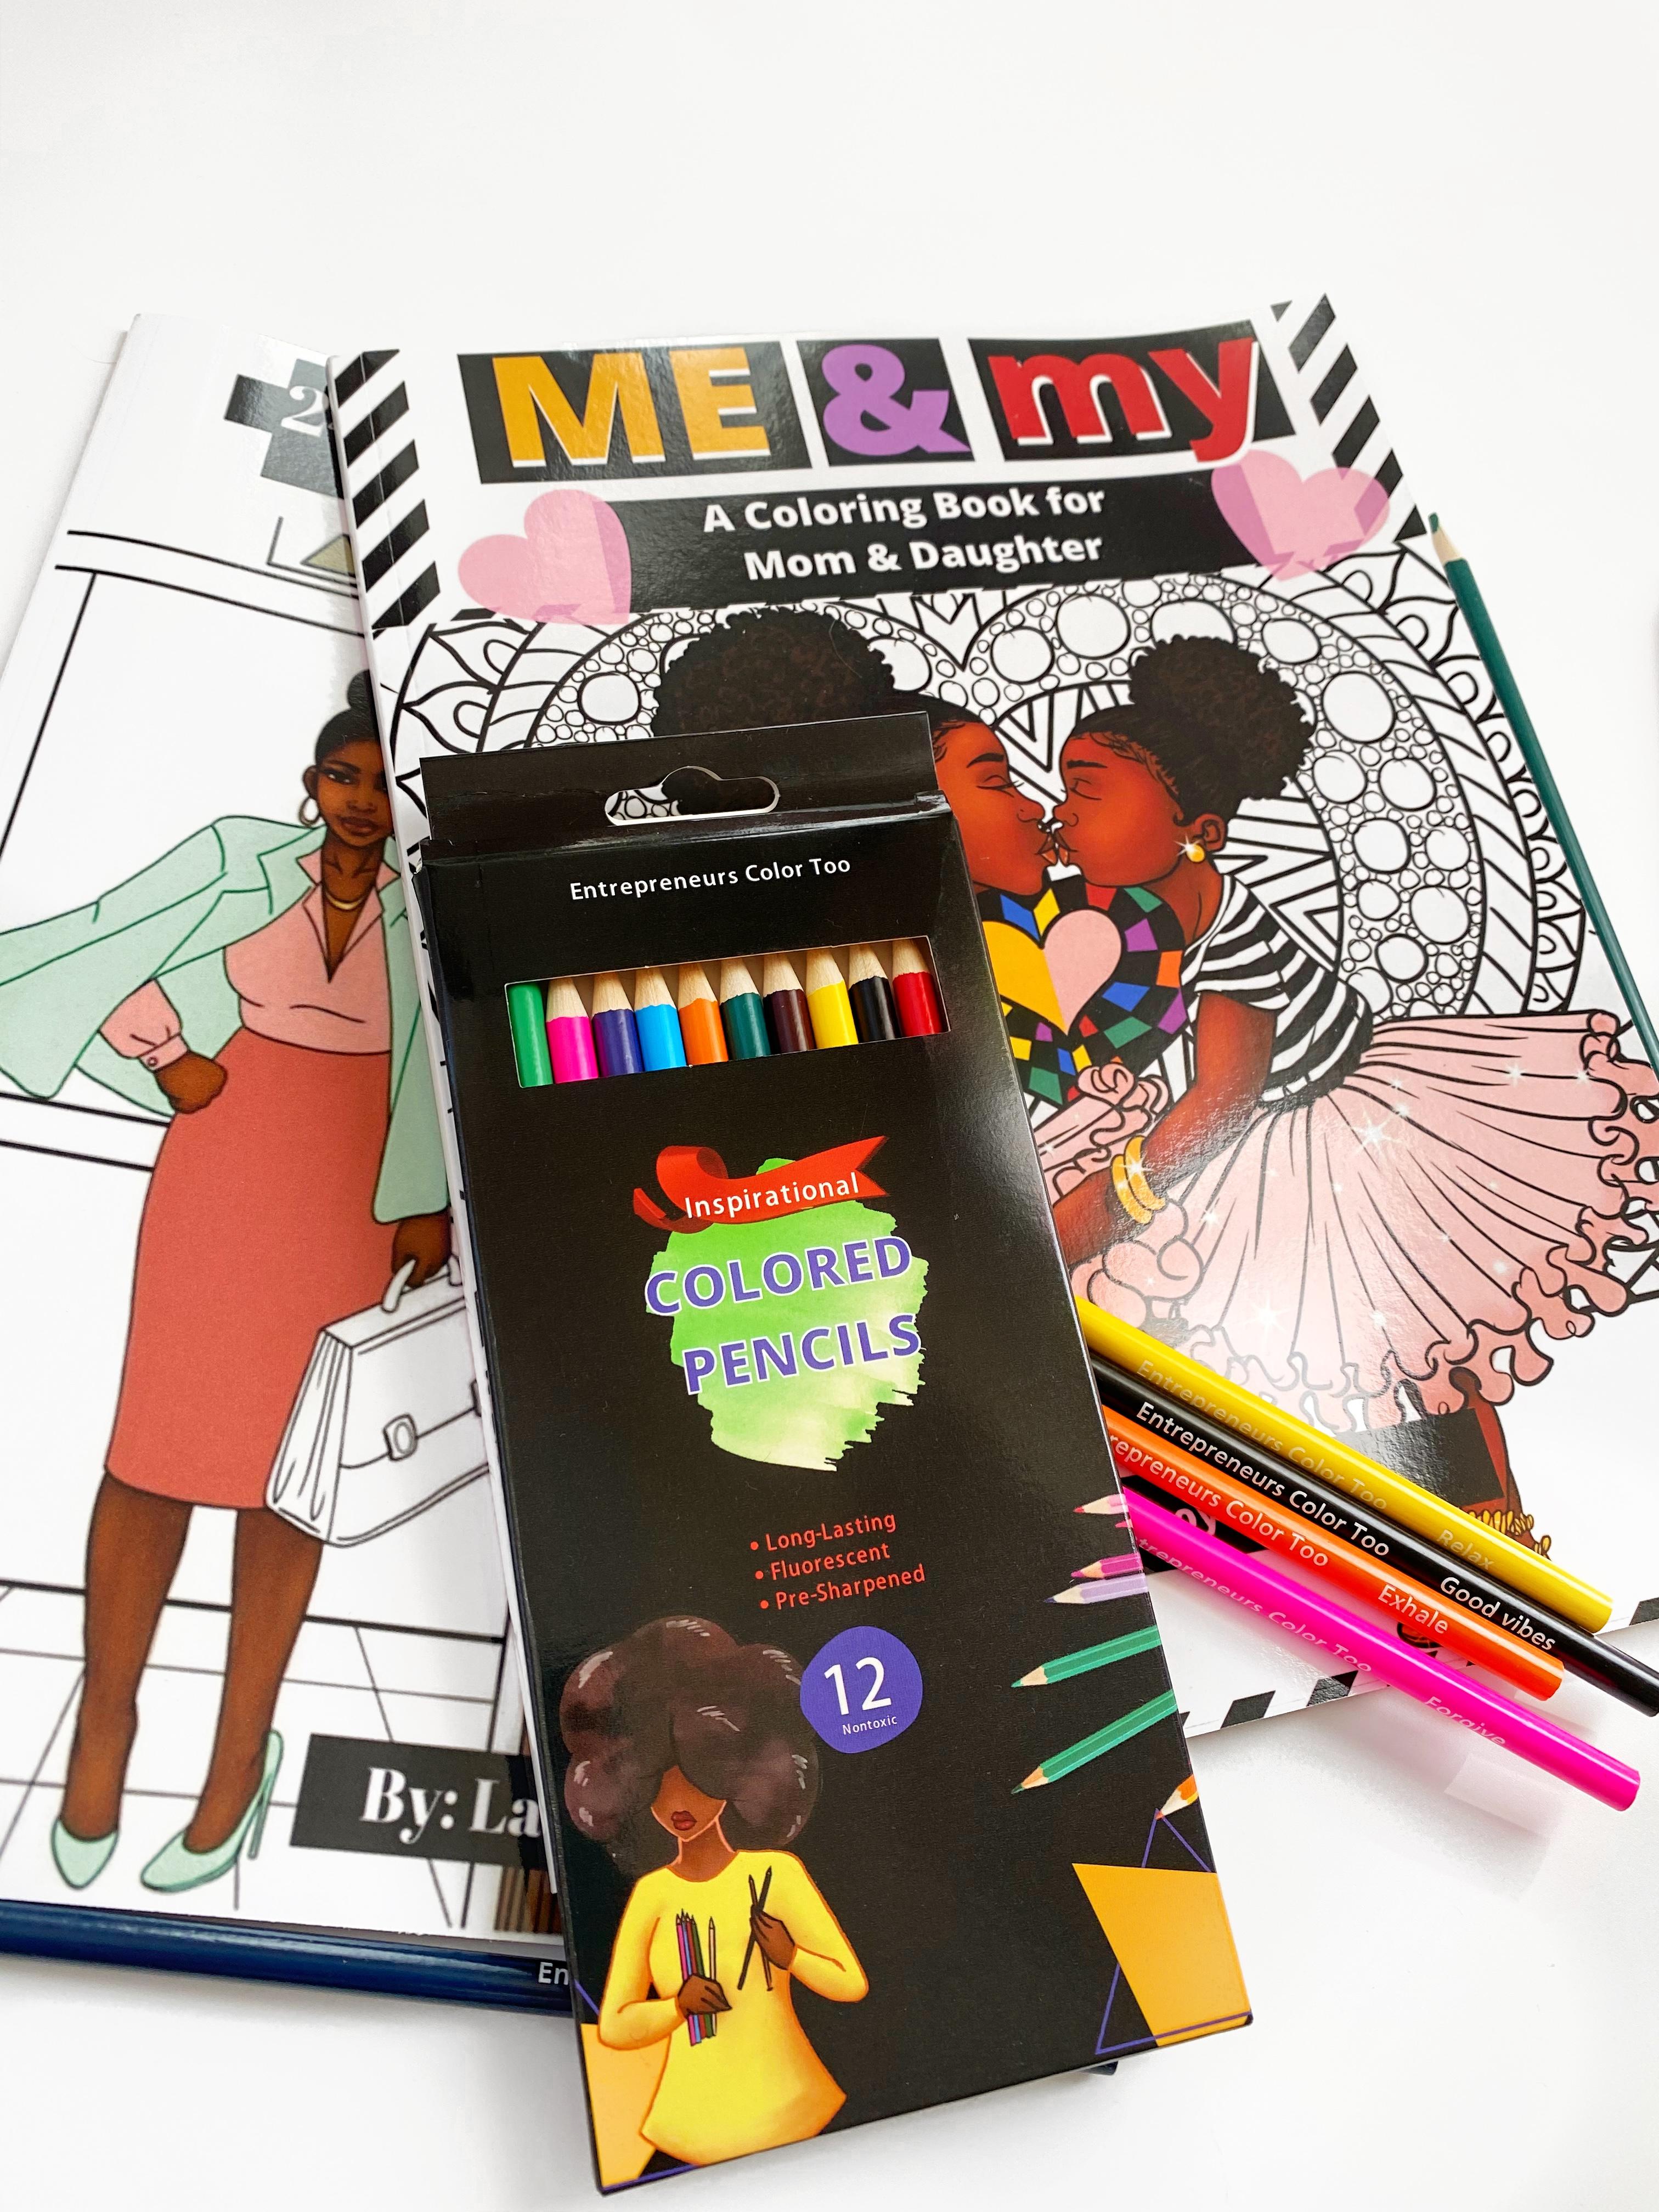 Latoya Nicole's Coloring Books & Pencils